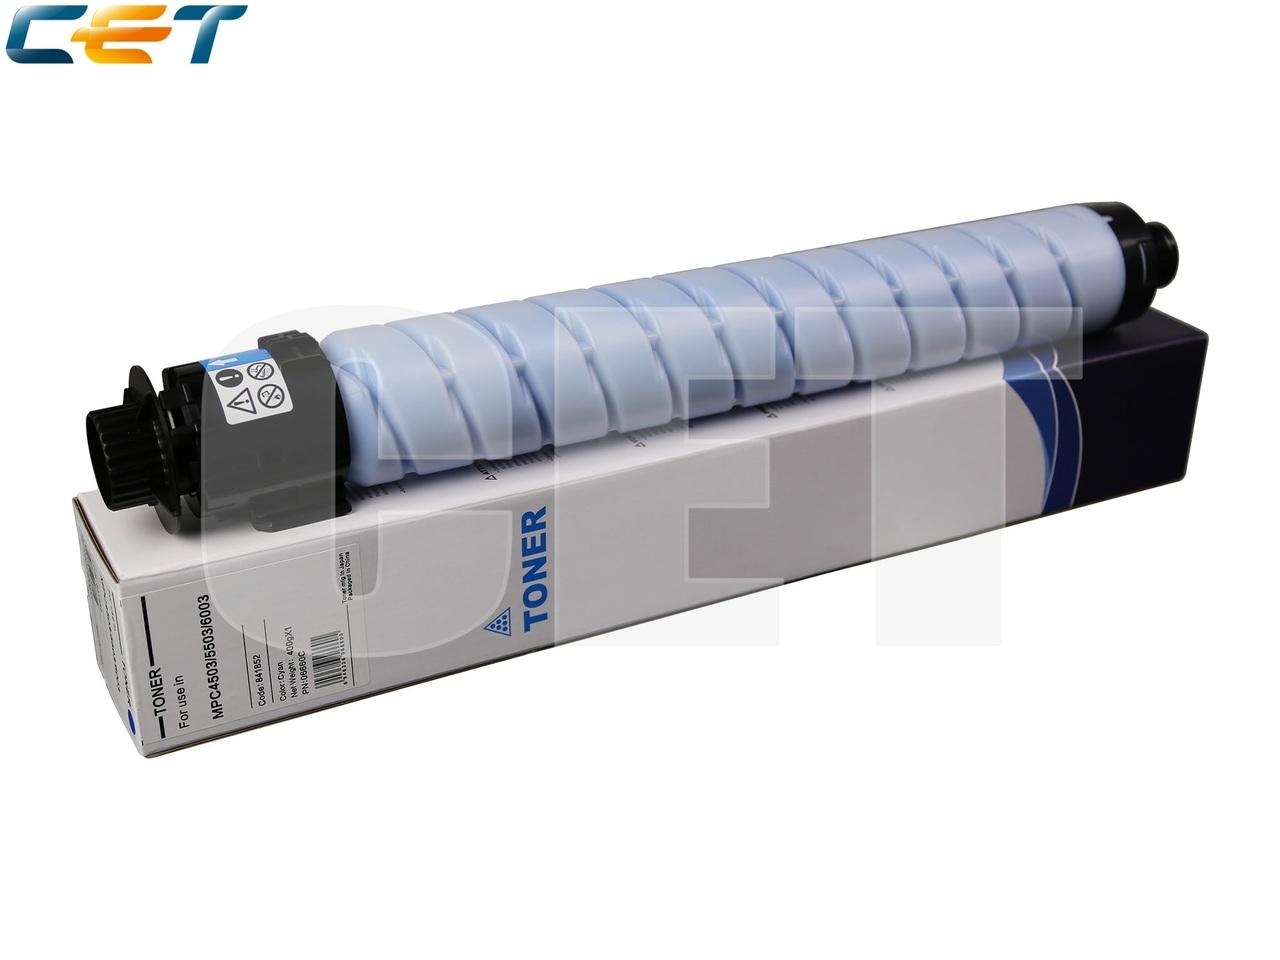 Тонер-картридж 841856 для RICOHMPC4503/MPC5503/MPC6003/MPC4504/MPC5504/MPC6004(CET) Cyan, 400г, 22500 стр., CET6660C